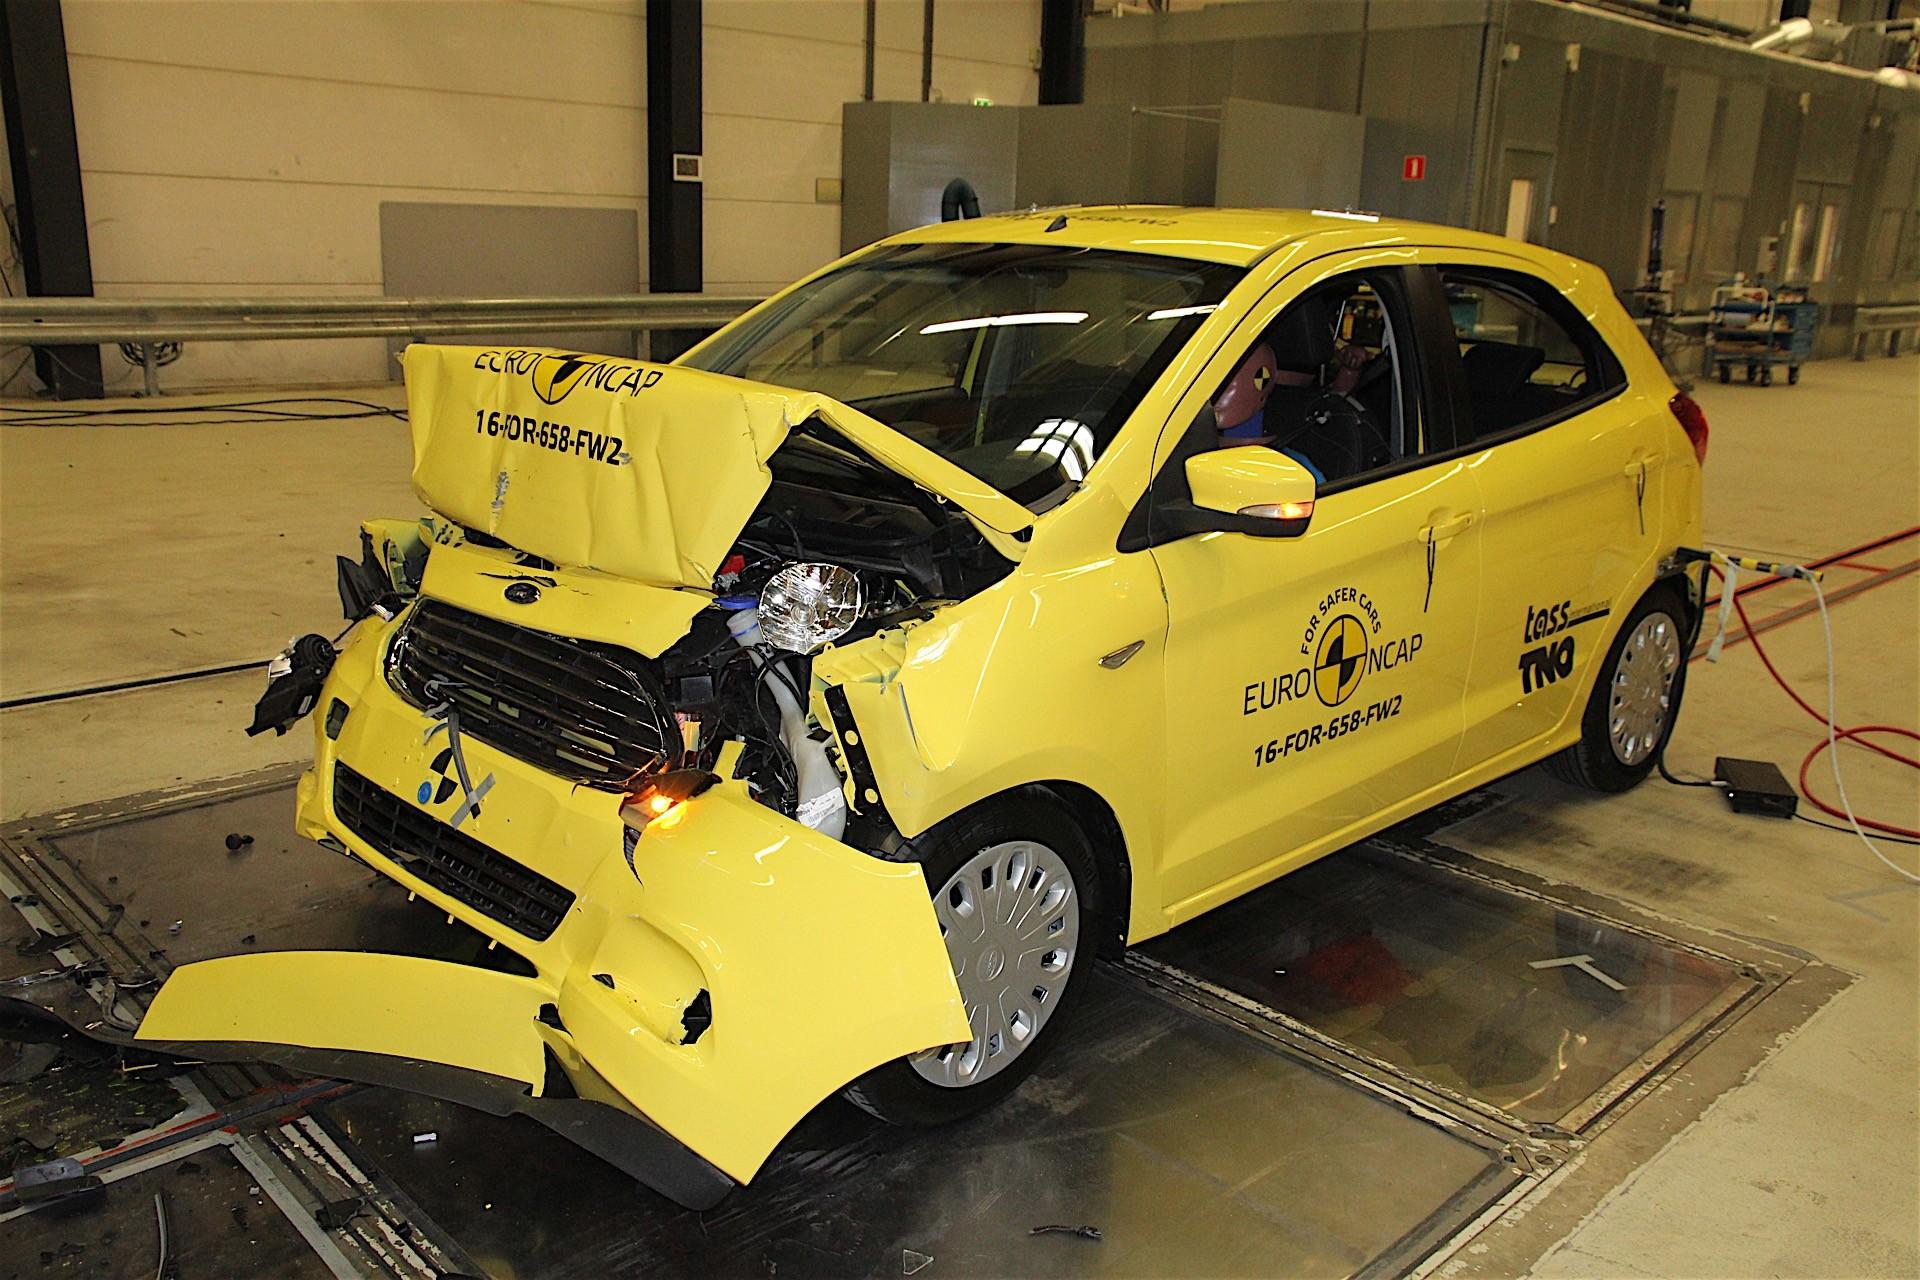 Euro NCAP (The European New Car Assessment Program)